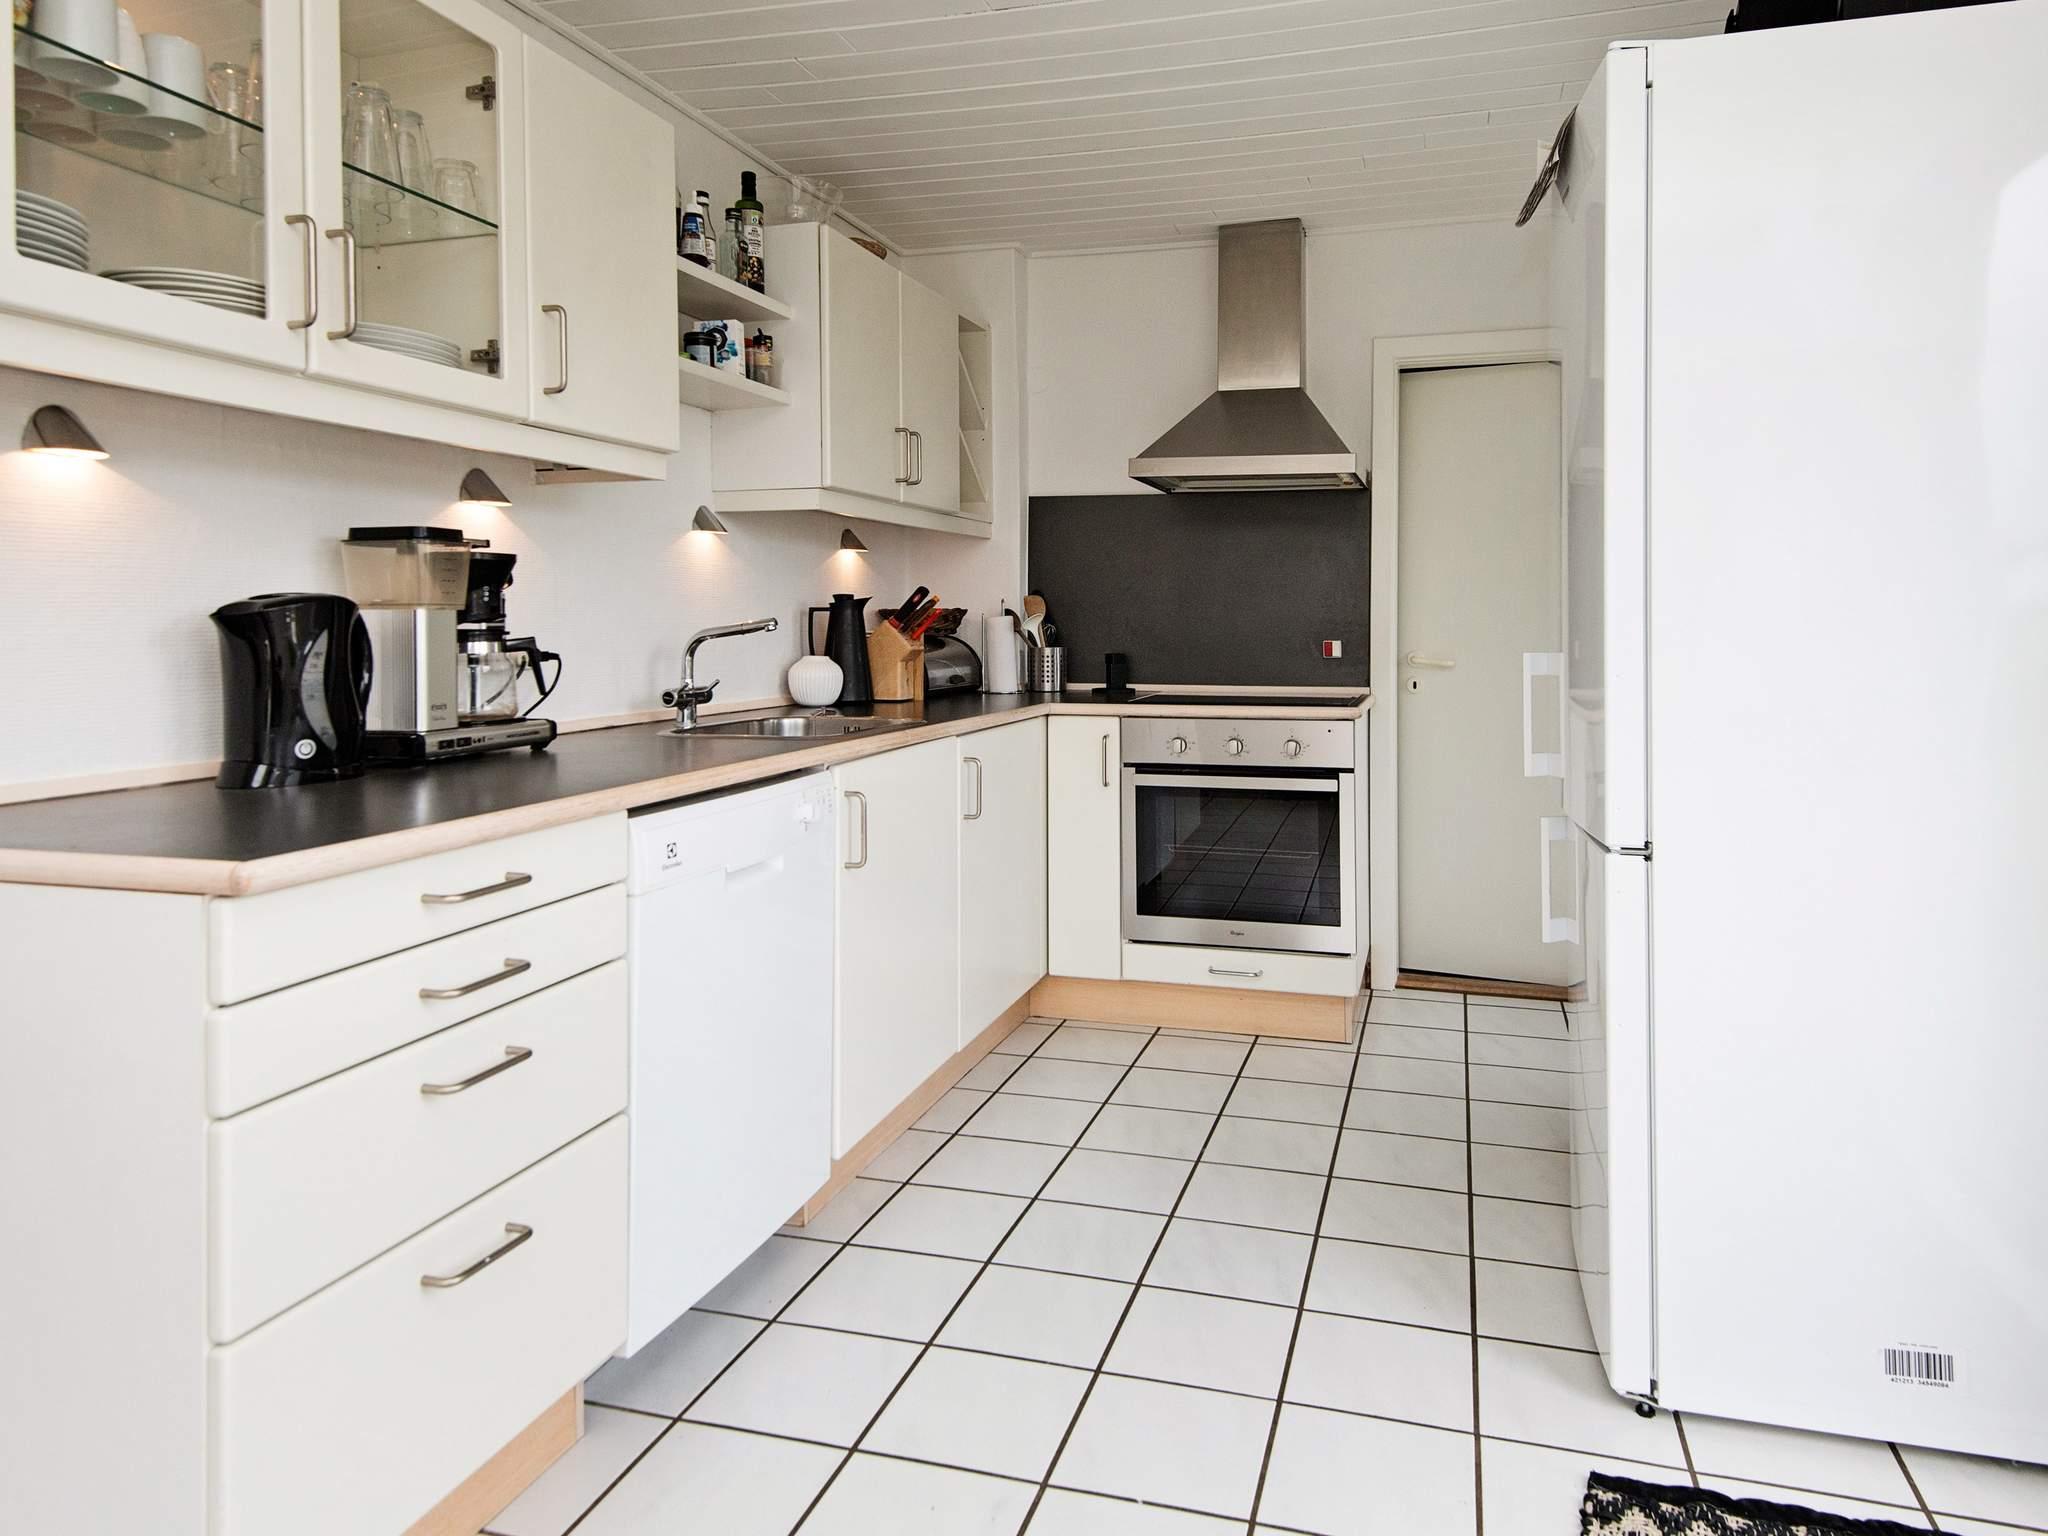 Ferienhaus Ajstrup Strand/Malling (2355032), Ajstrup, , Dänische Ostsee, Dänemark, Bild 2